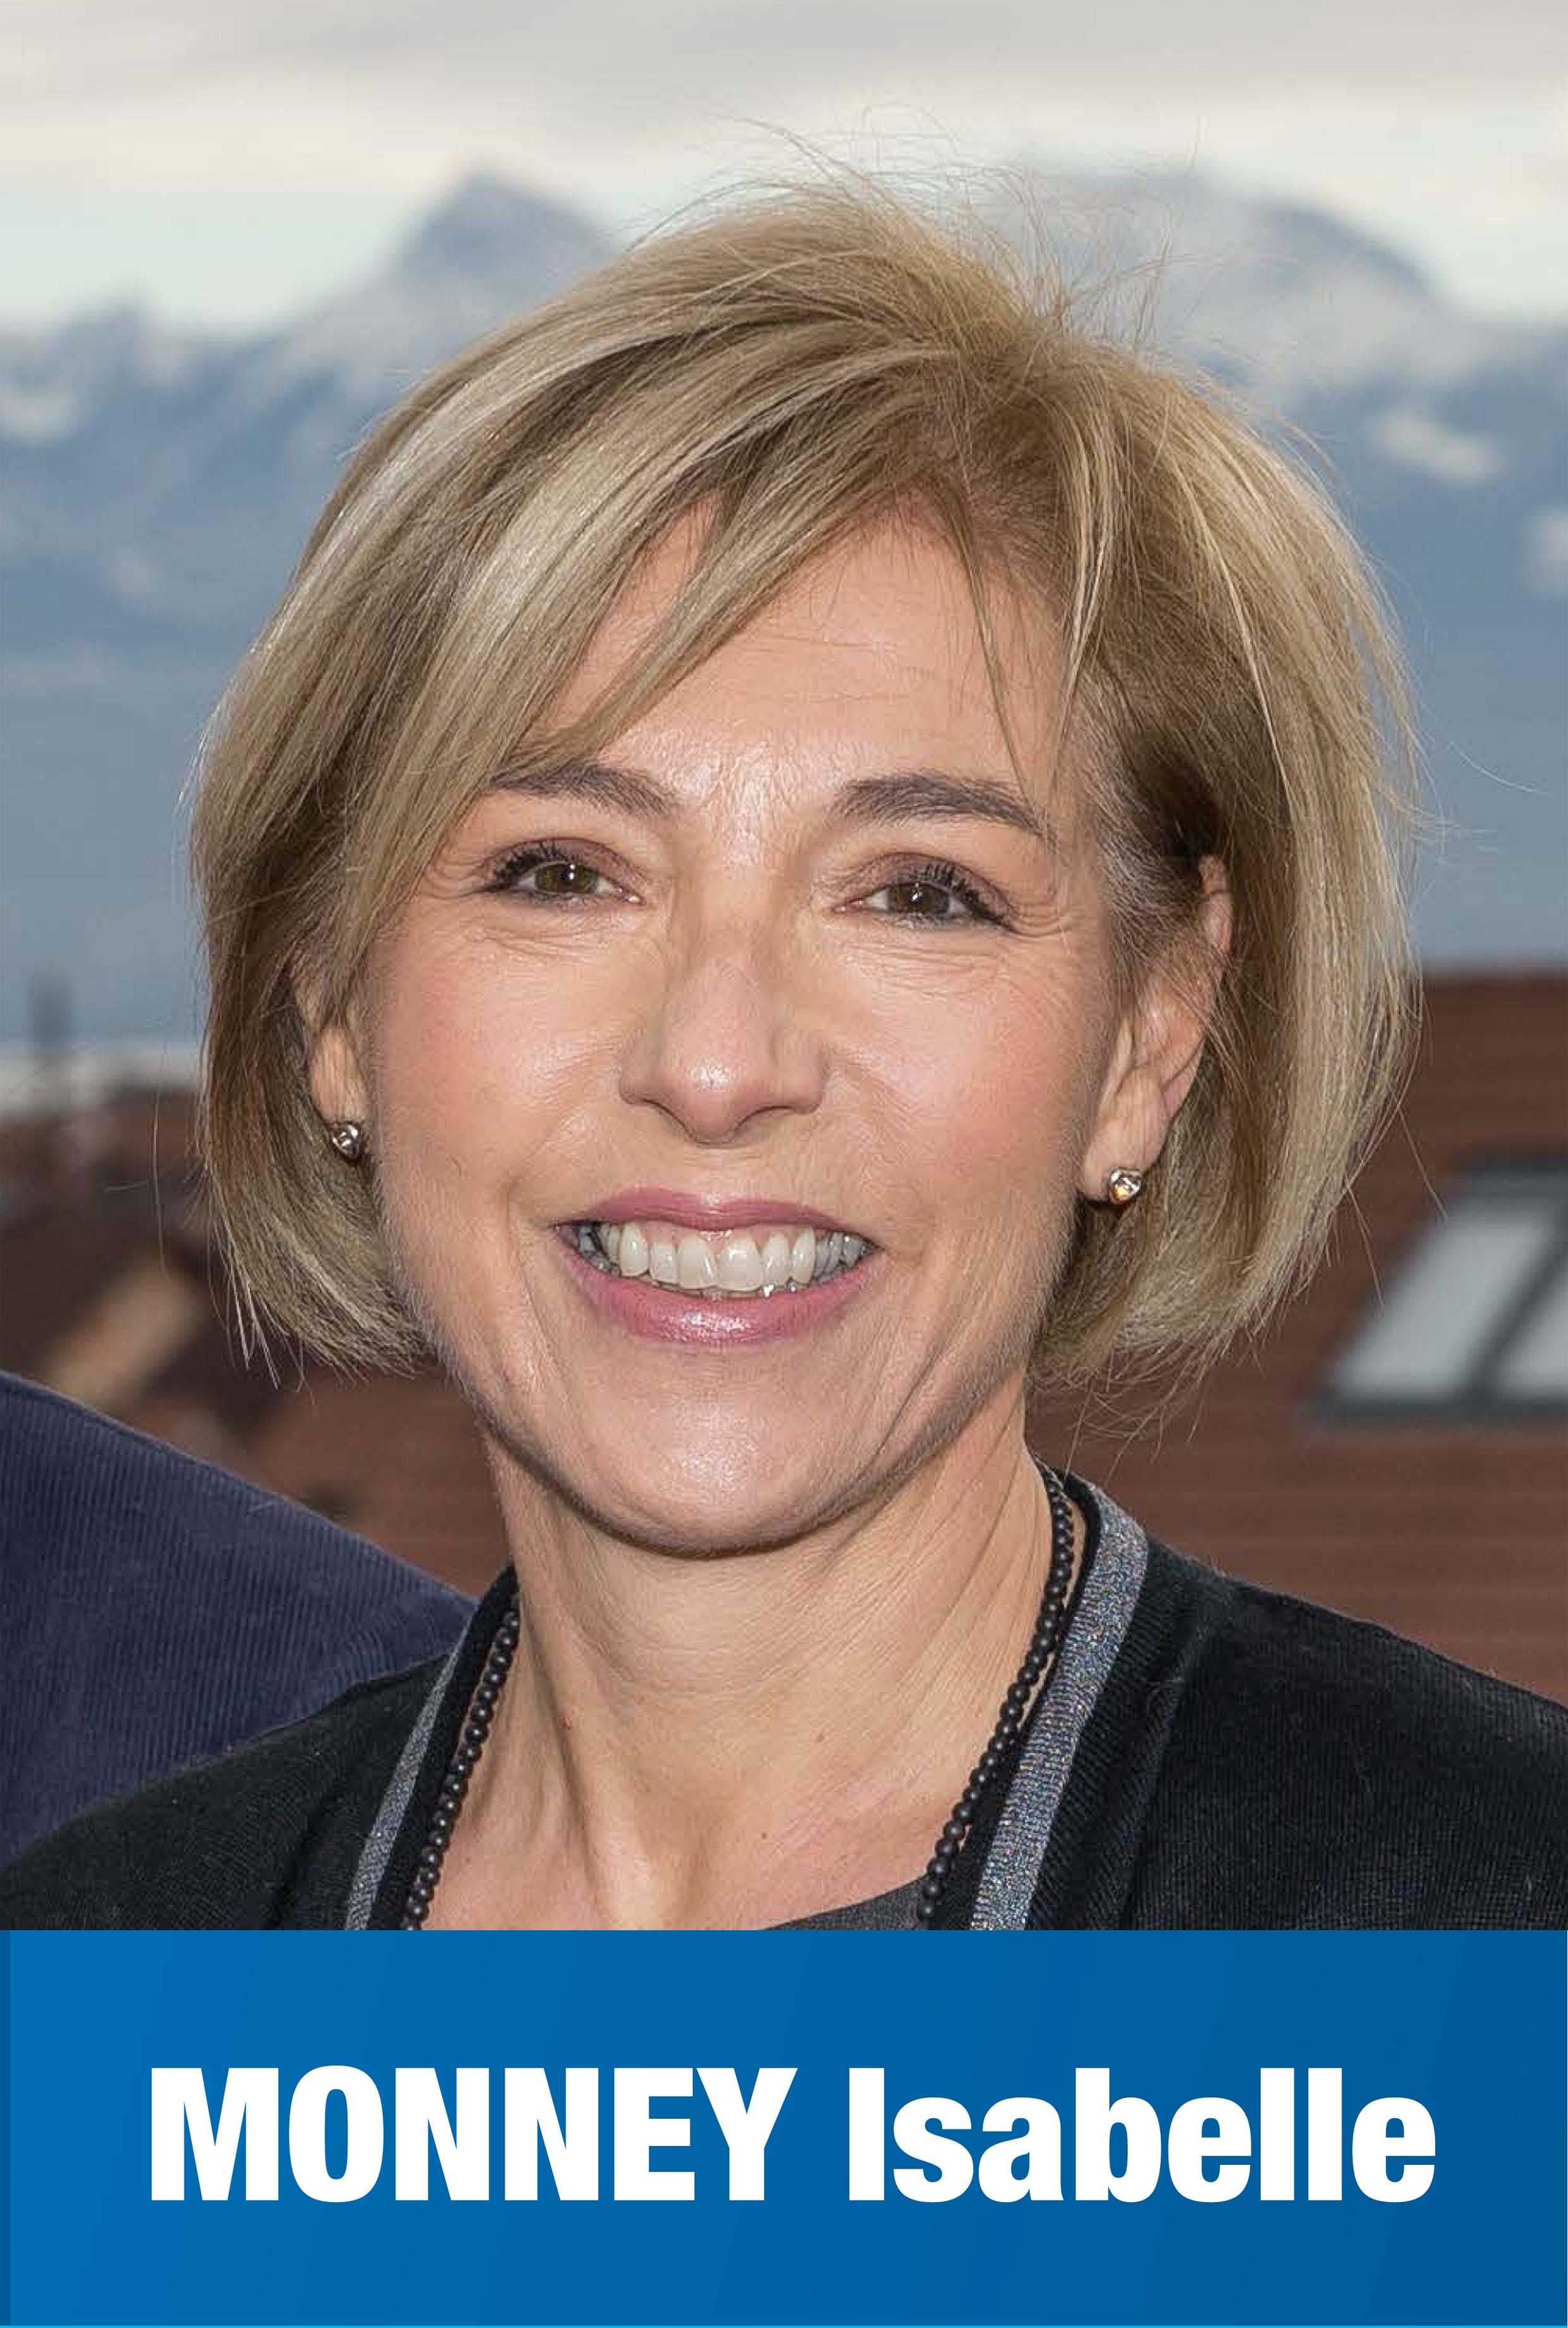 Isabelle Monney